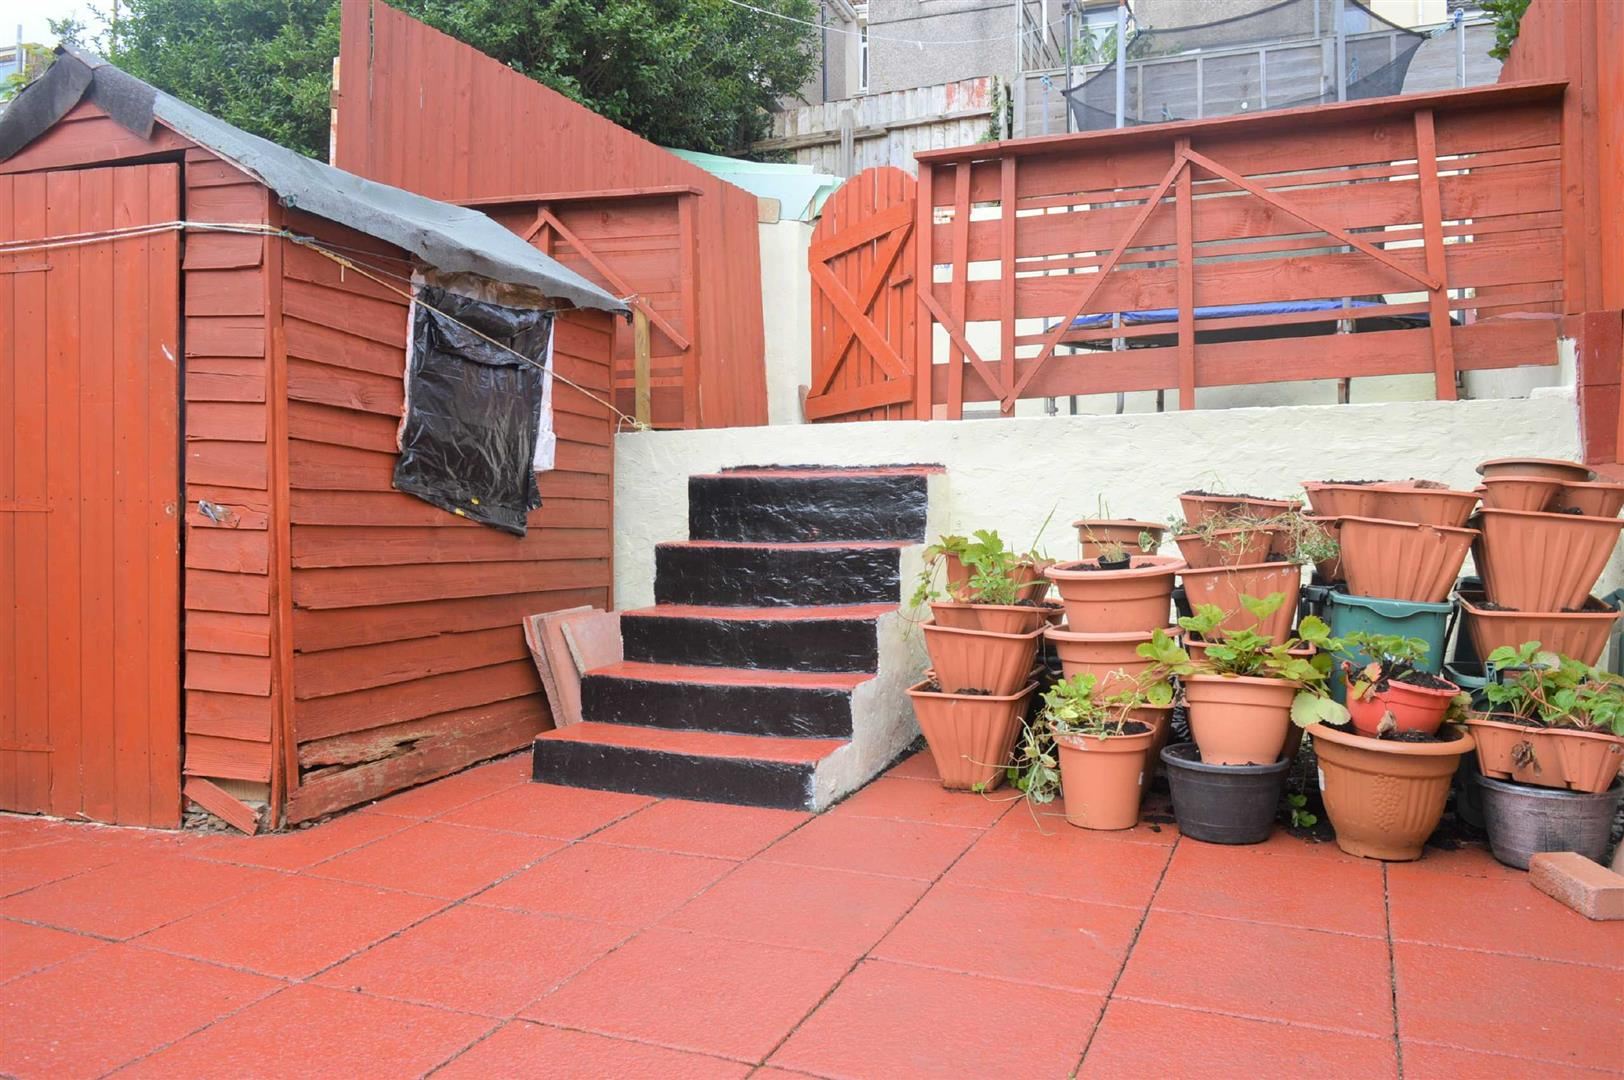 Waun Wen Terrace, Waun Wen, Swansea, SA1 1DX